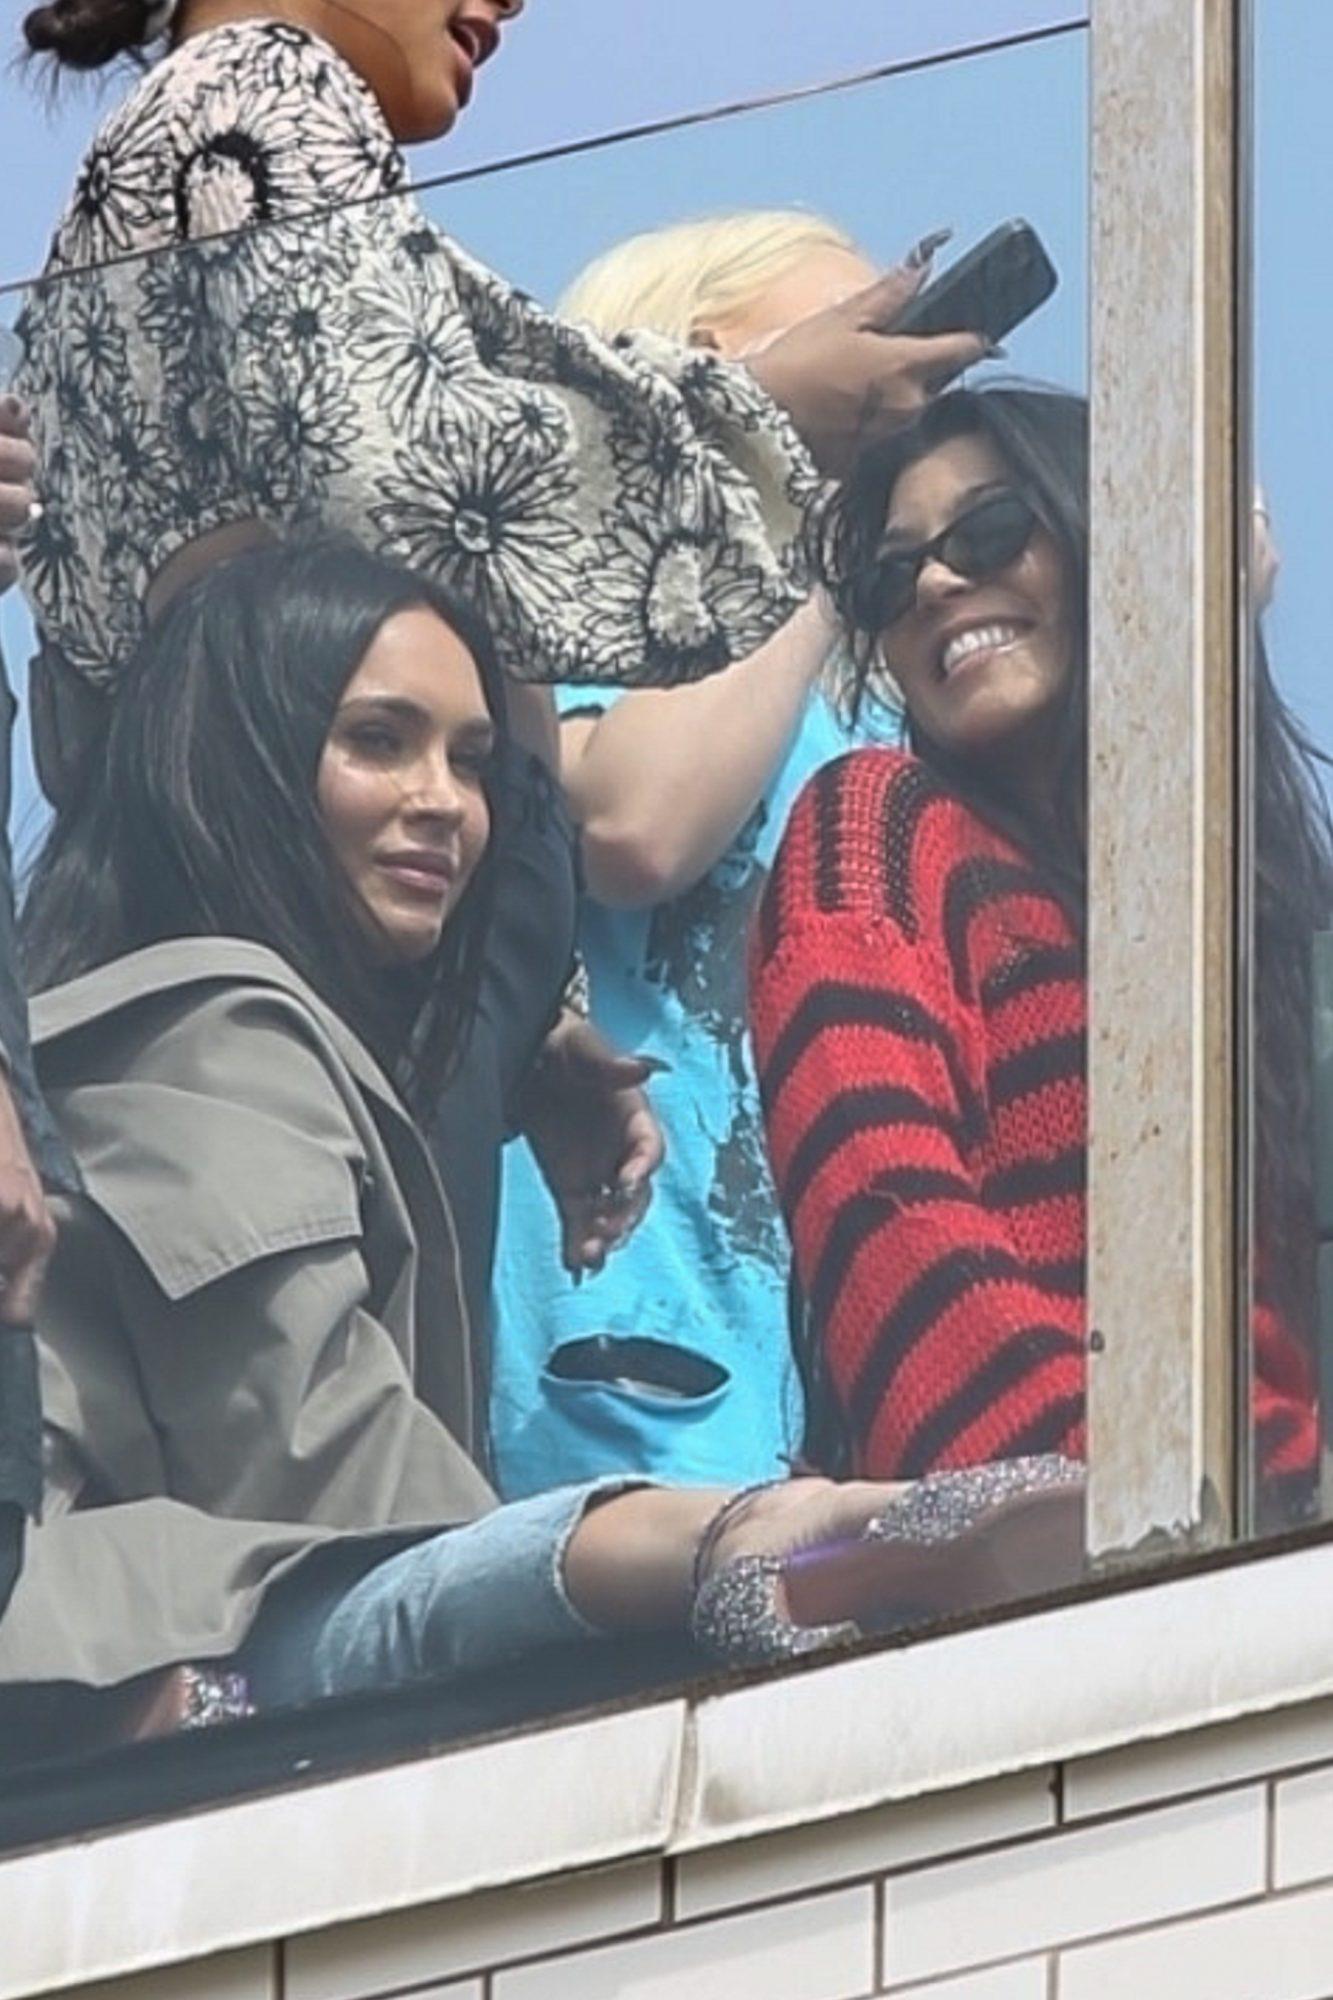 Megan Fox Bonds with Kourtney Kardashian as they Watch MGK and Travis Barker's Rooftop Performance